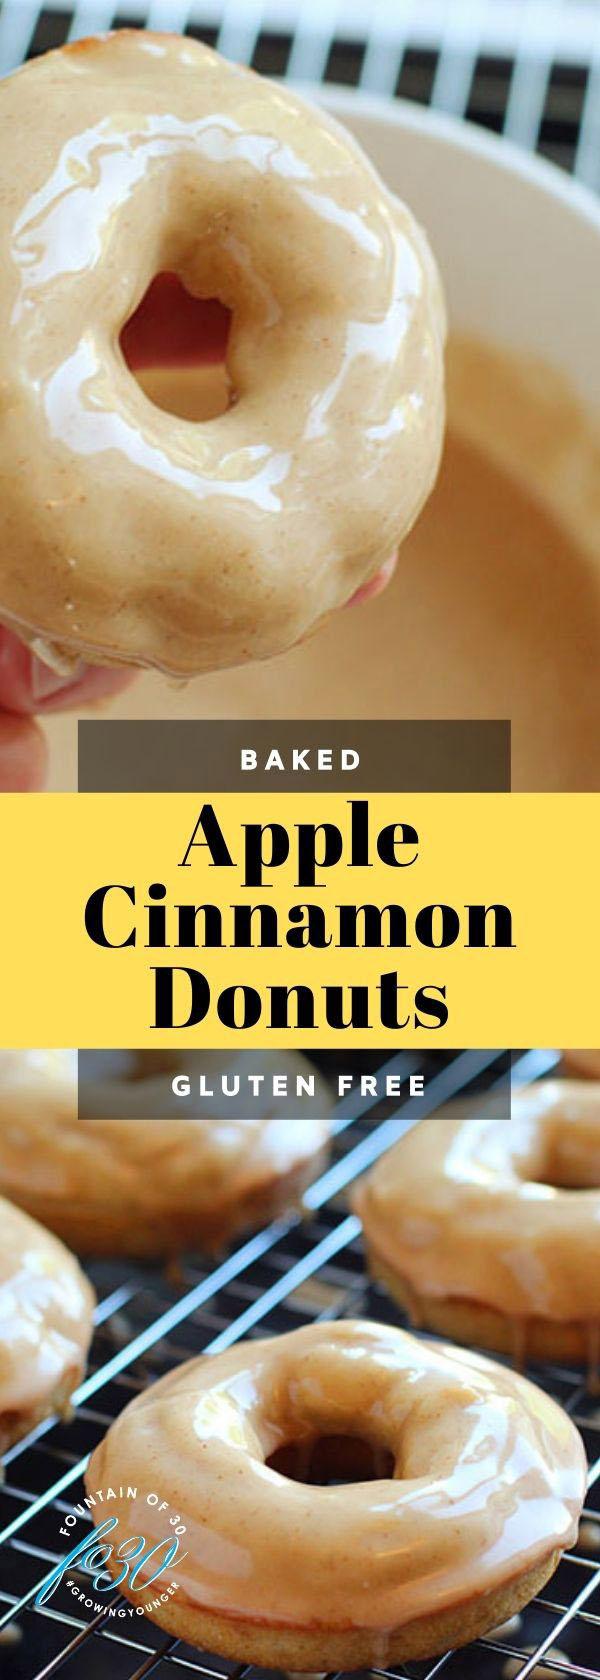 glazed apple baked donuts fountainof30